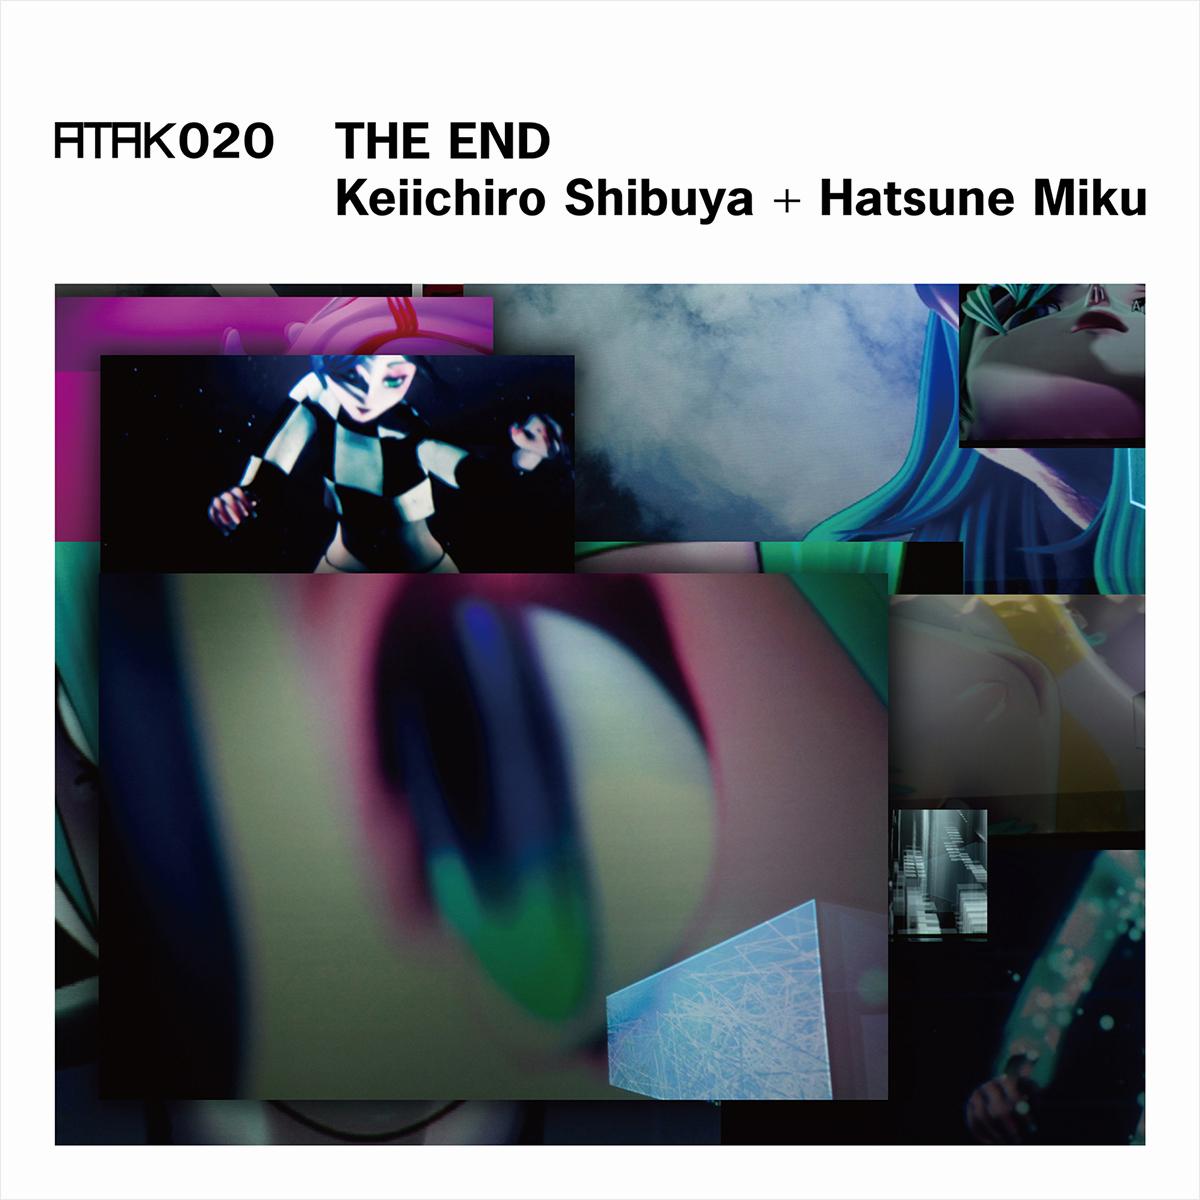 ATAK020 THE END